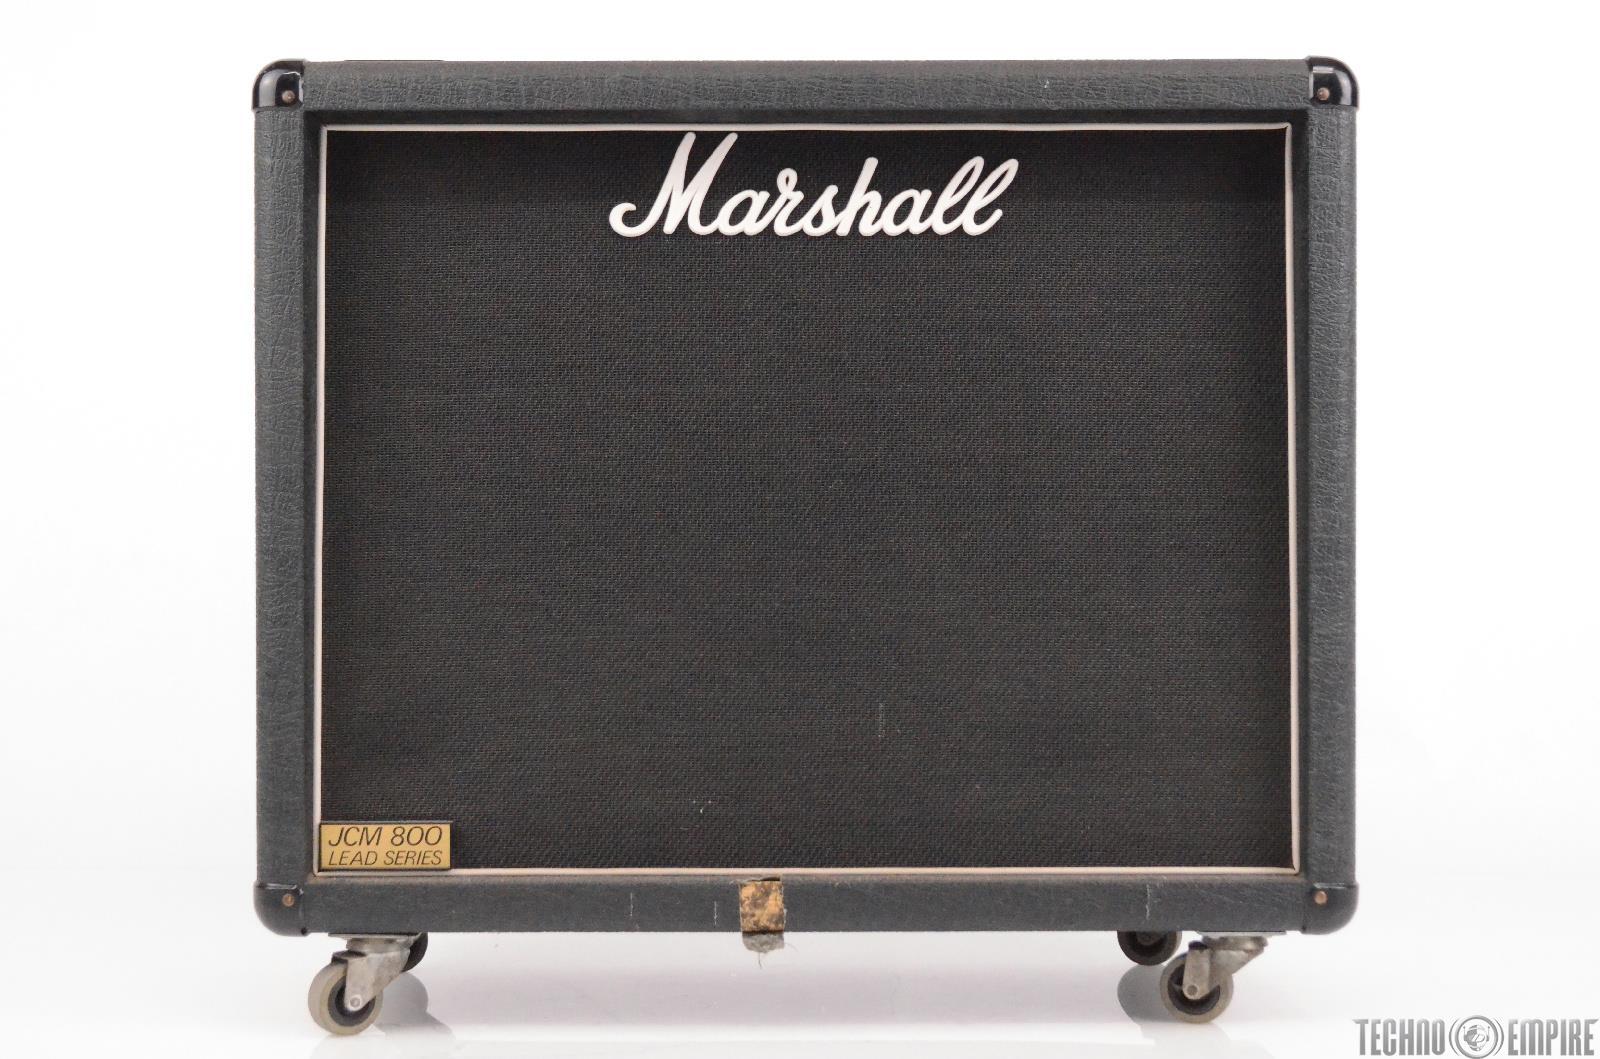 marshall jcm 800 1936 lead series 2x12 guitar speaker cabinet cab 31248 ebay. Black Bedroom Furniture Sets. Home Design Ideas